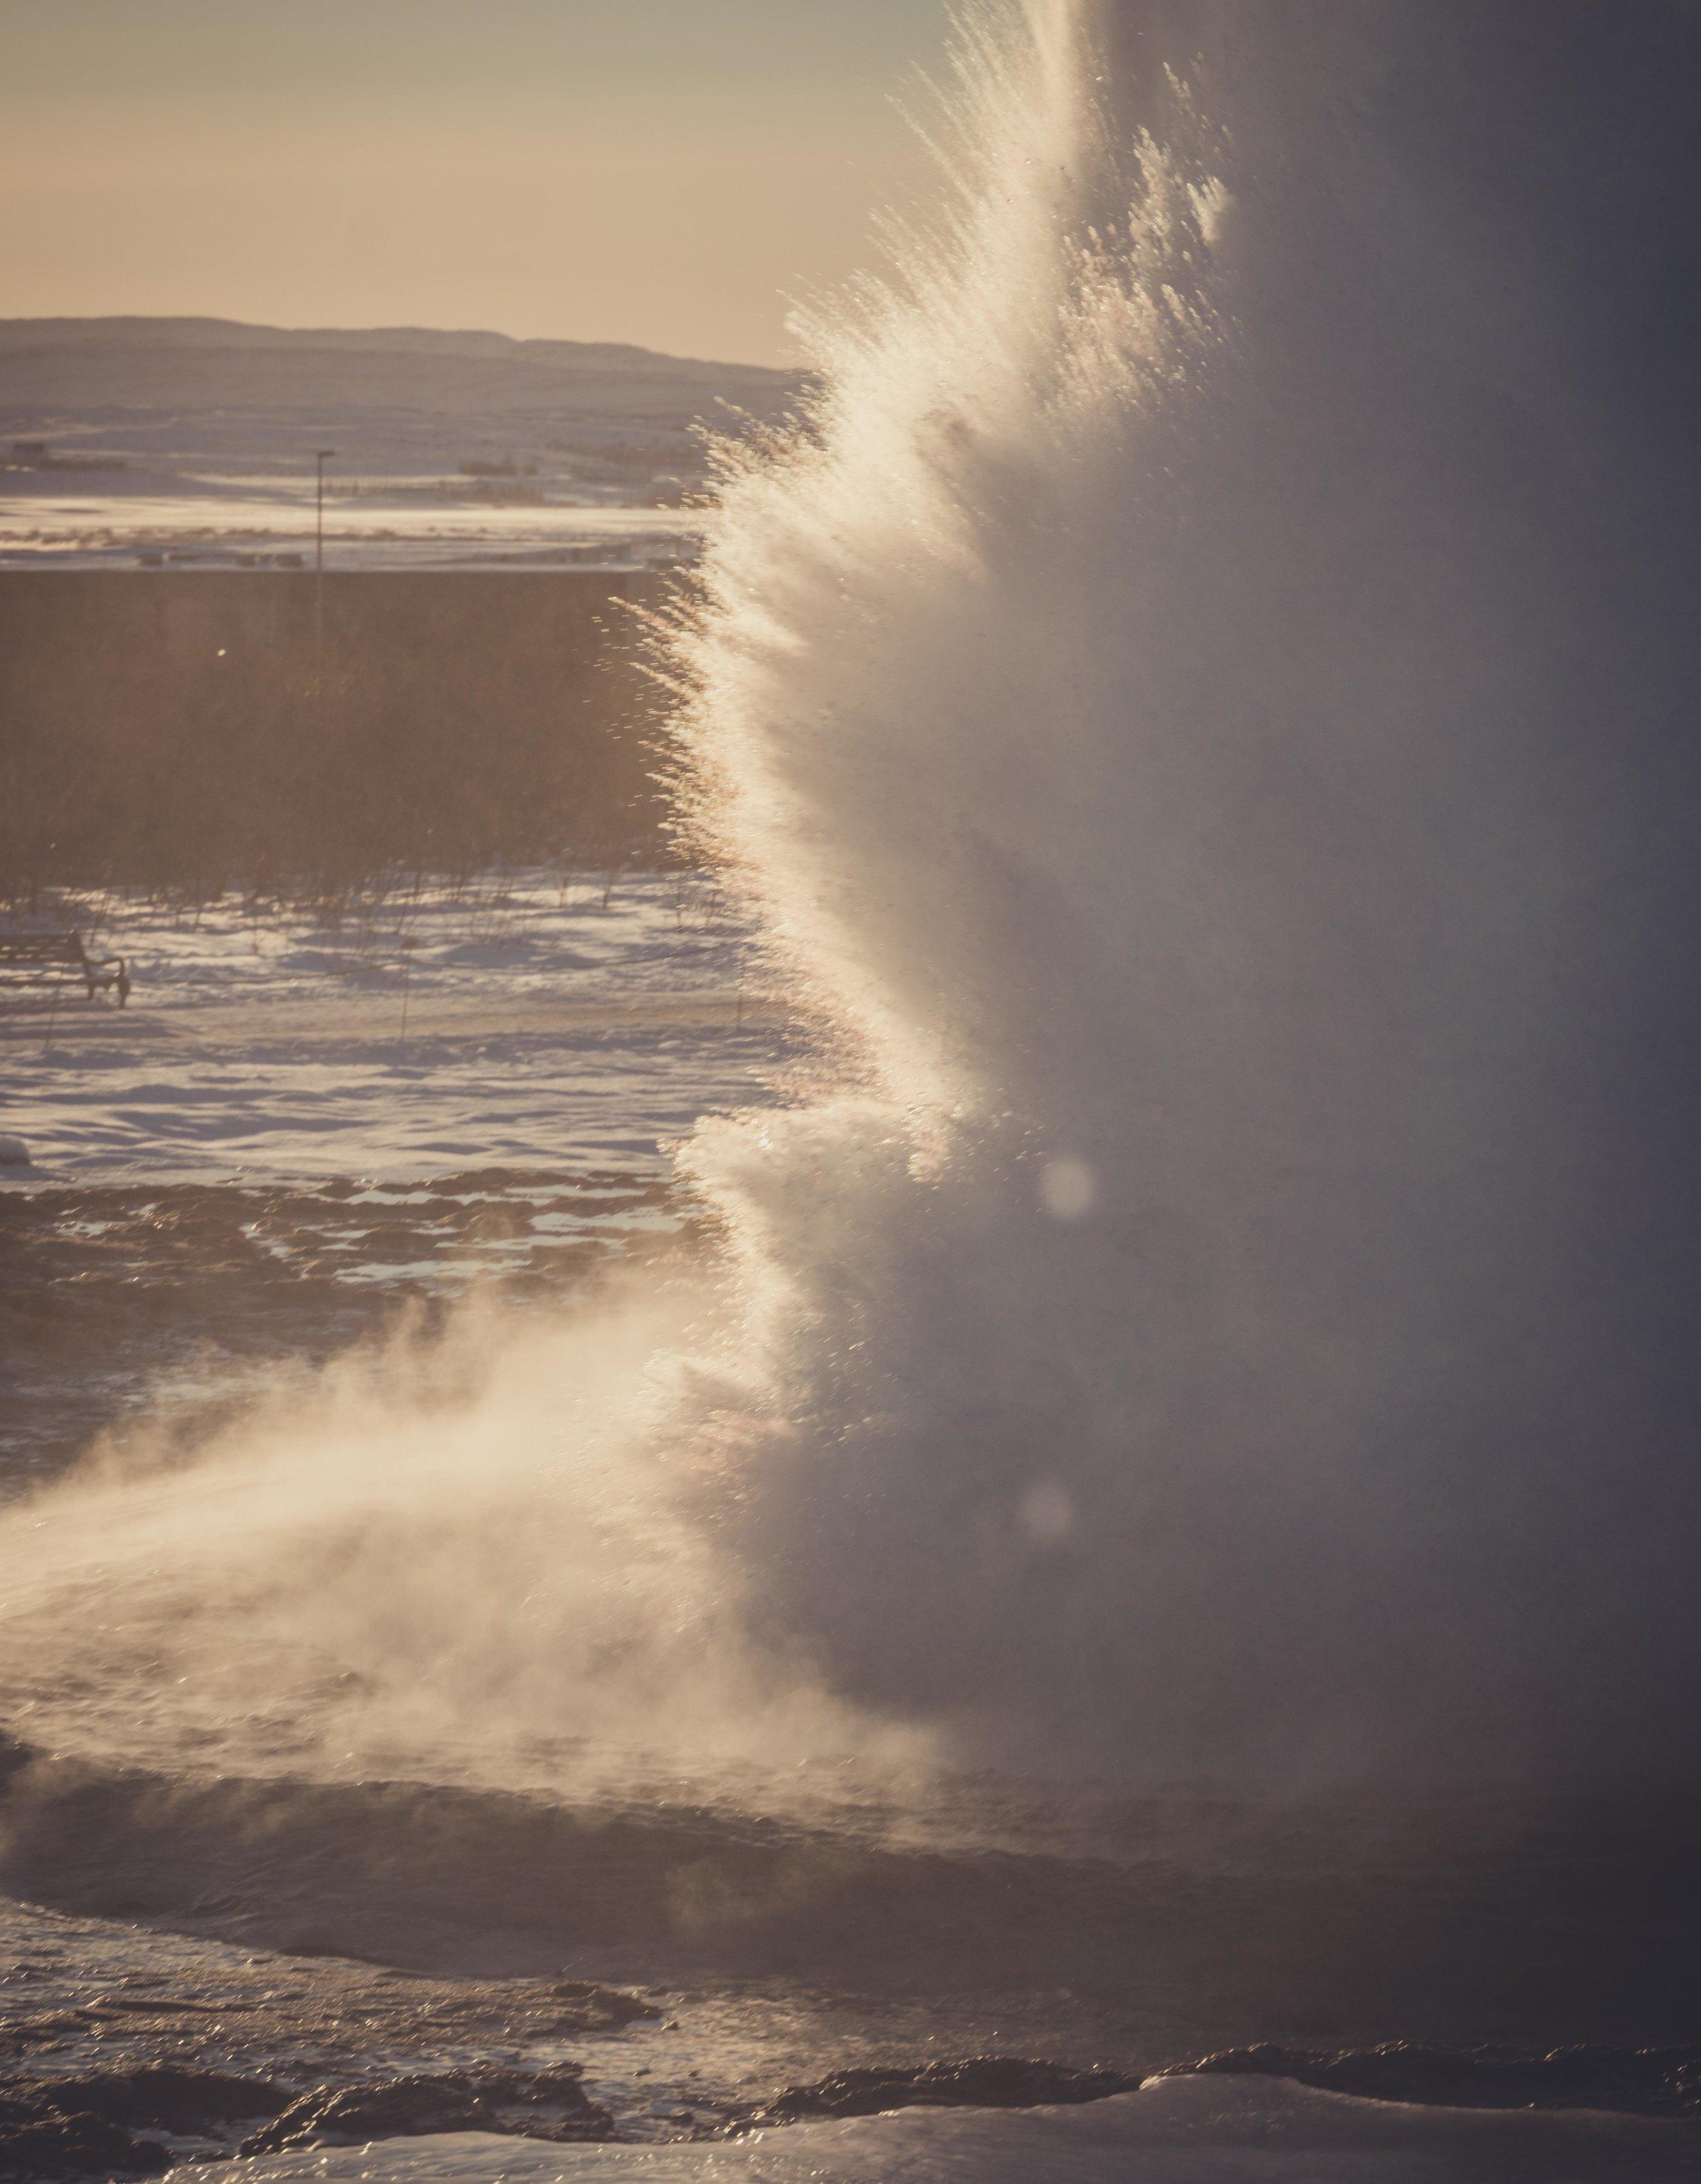 Iceland. snow. travel. adventure. photography. trip. epic landscape. snow. cold. freezing. sunrise. long exposure selfie. blow hole.jpg